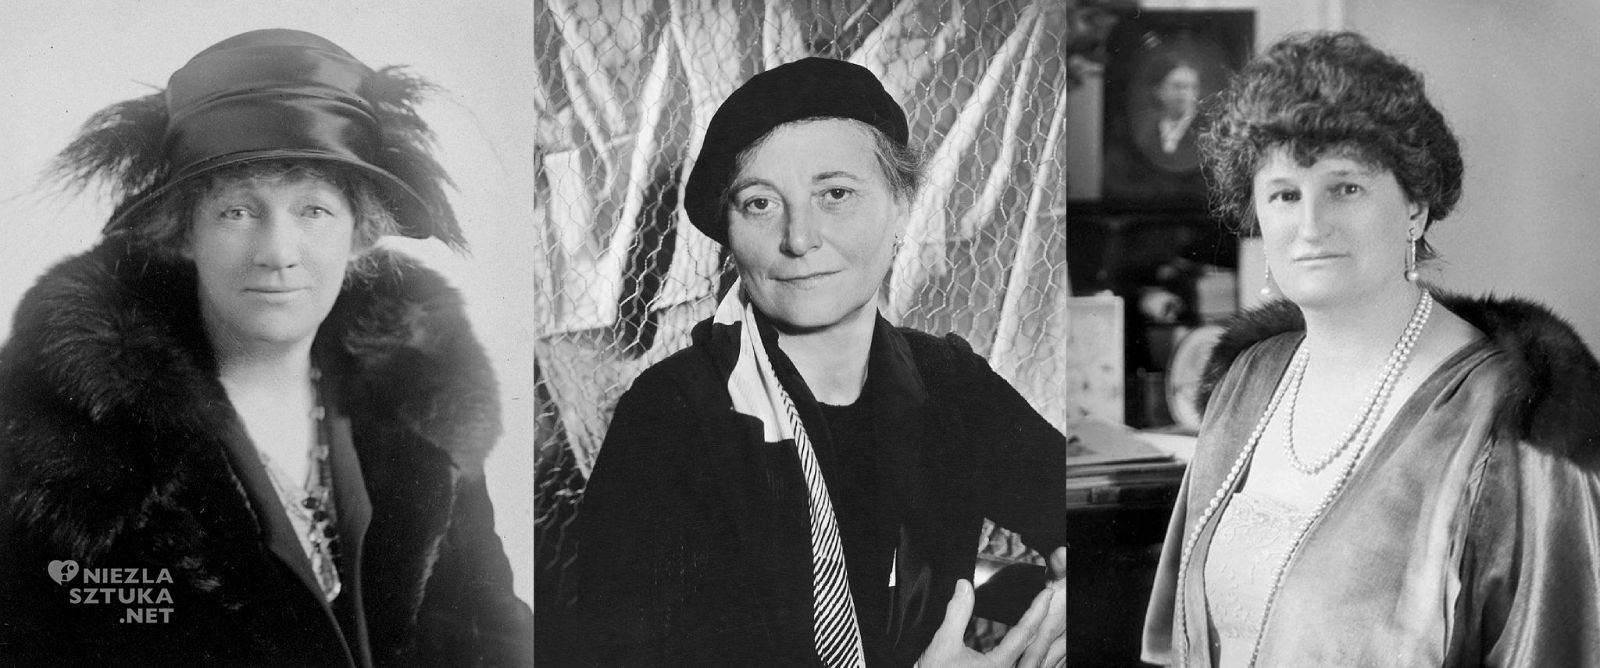 Liliie P. Bliss, Mary Quinn Sulivann, Abby Aldrich Rockefeller, kobiety w sztuce, Niezła Sztuka